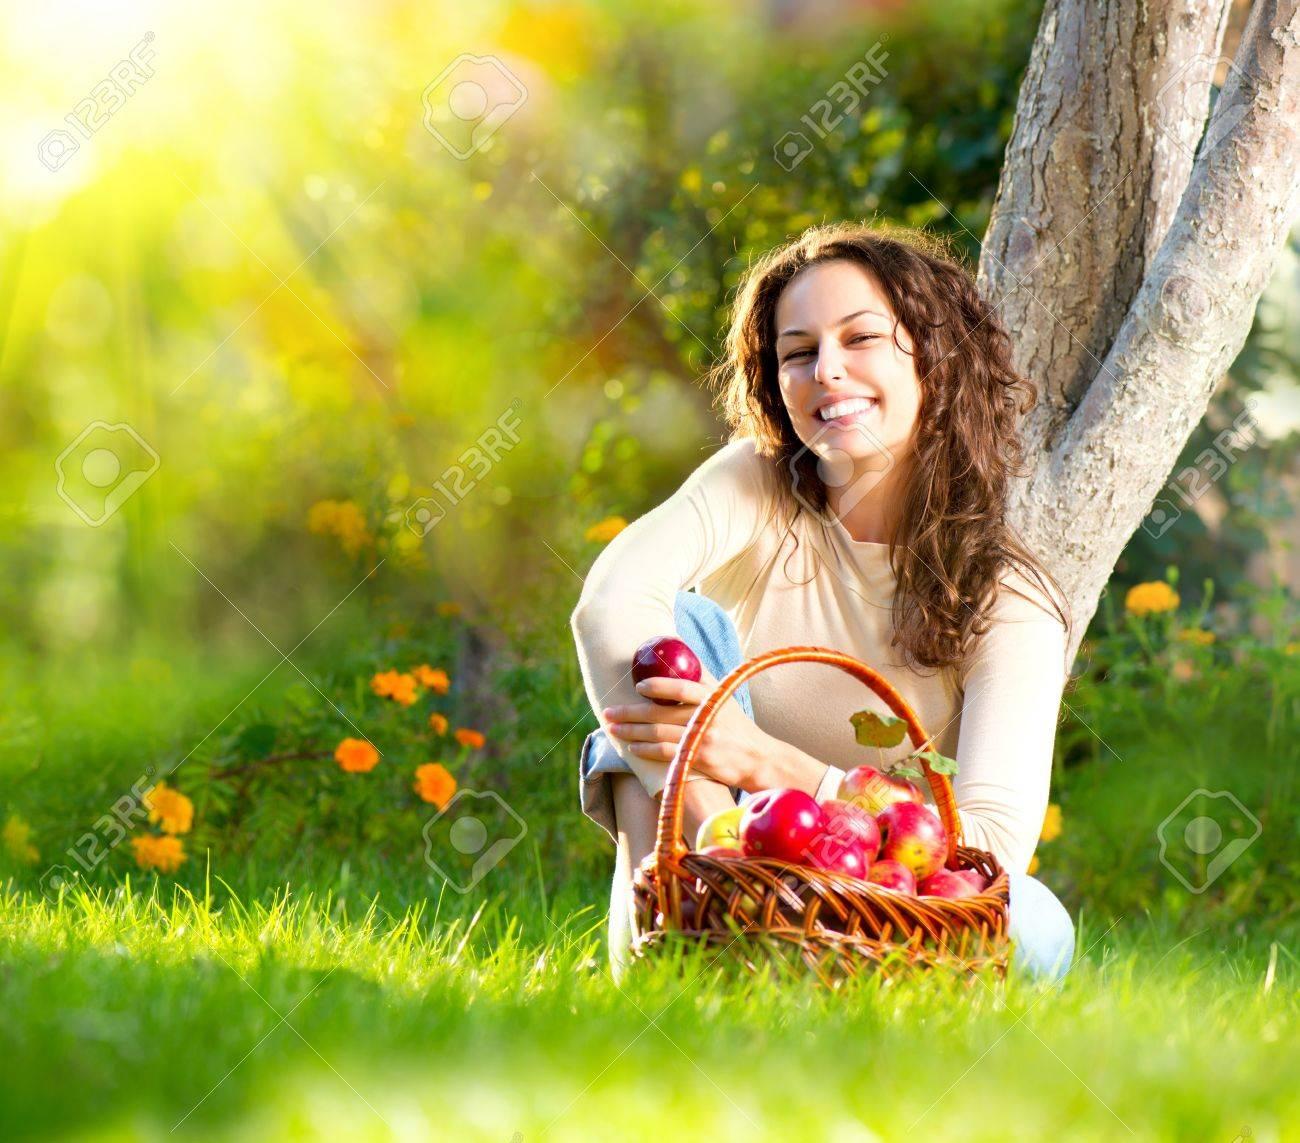 Beautiful Girl Eating Organic Apple in the Orchard Stock Photo - 15658041